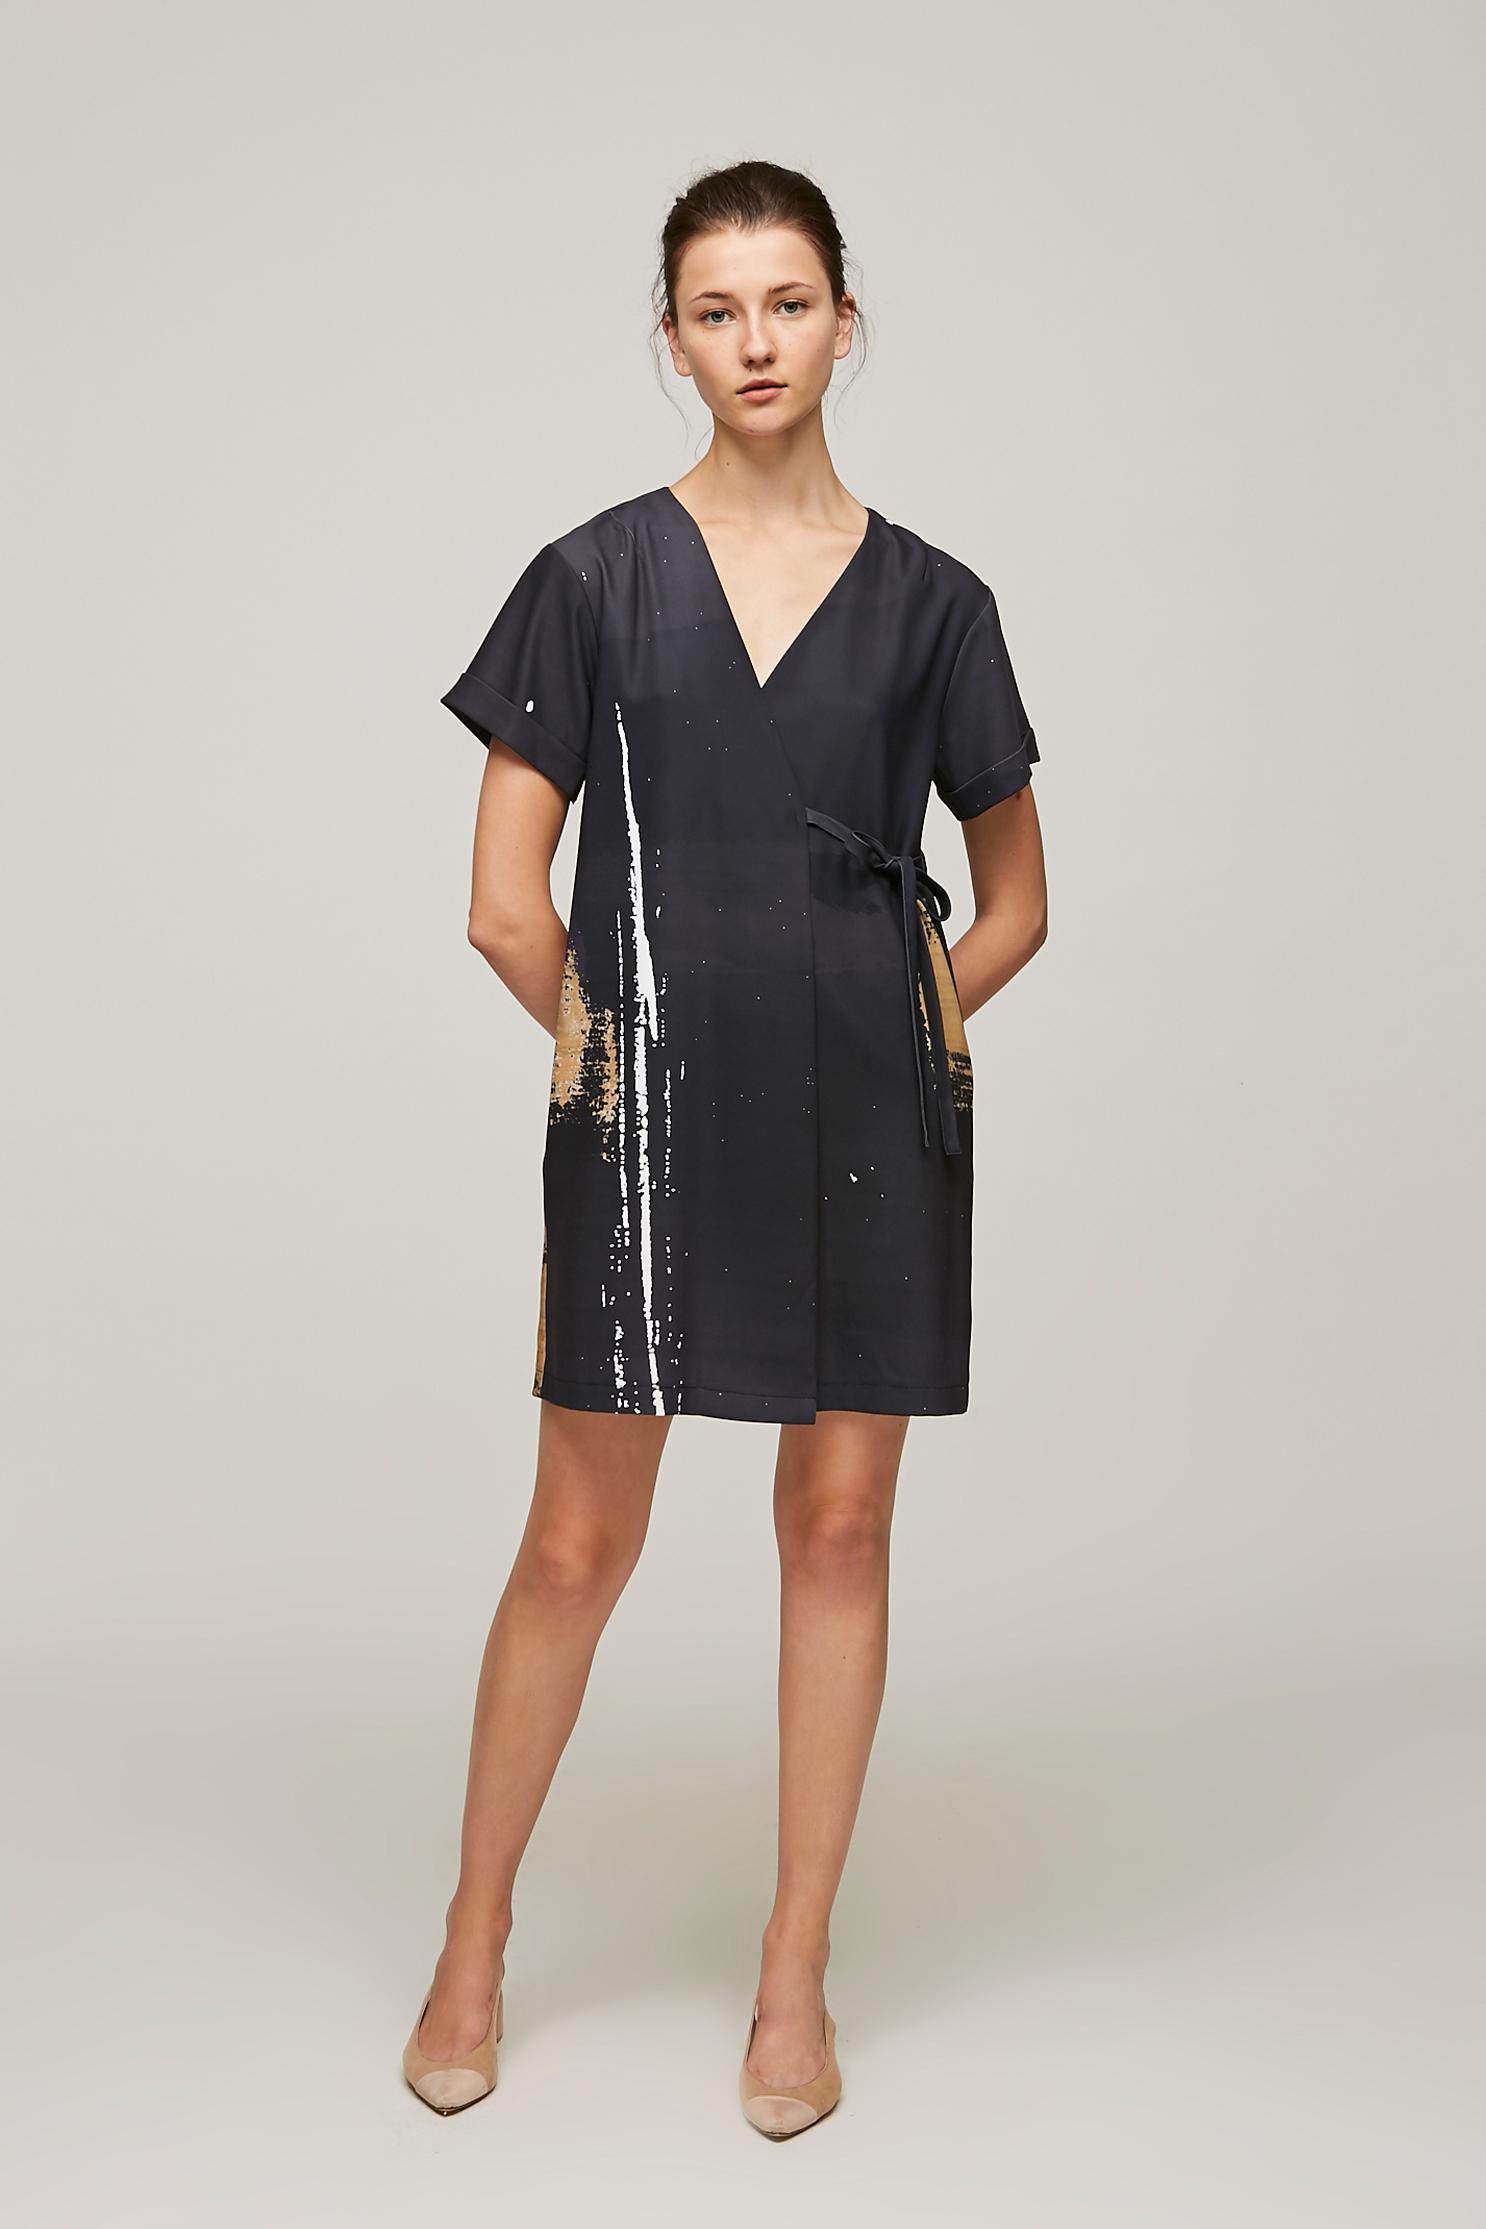 Dune Wrap Dress